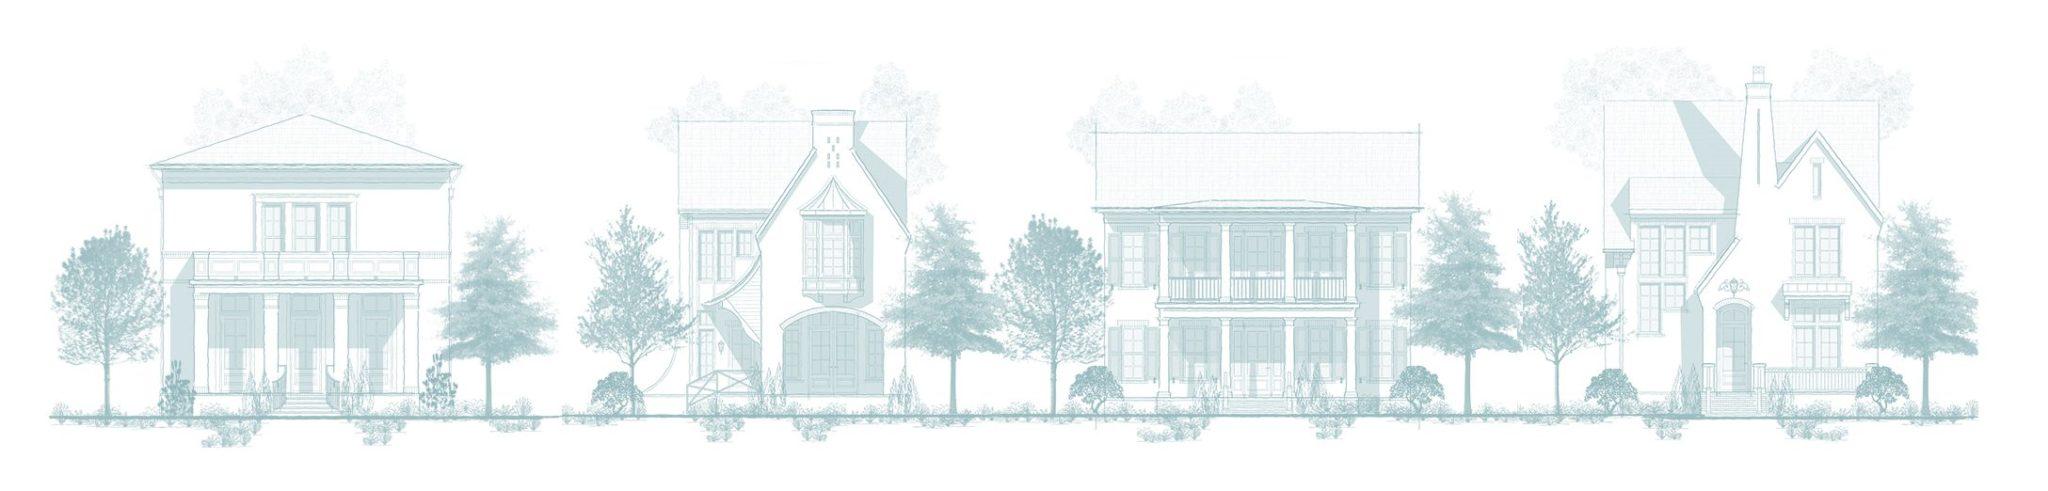 HomeFest Homes